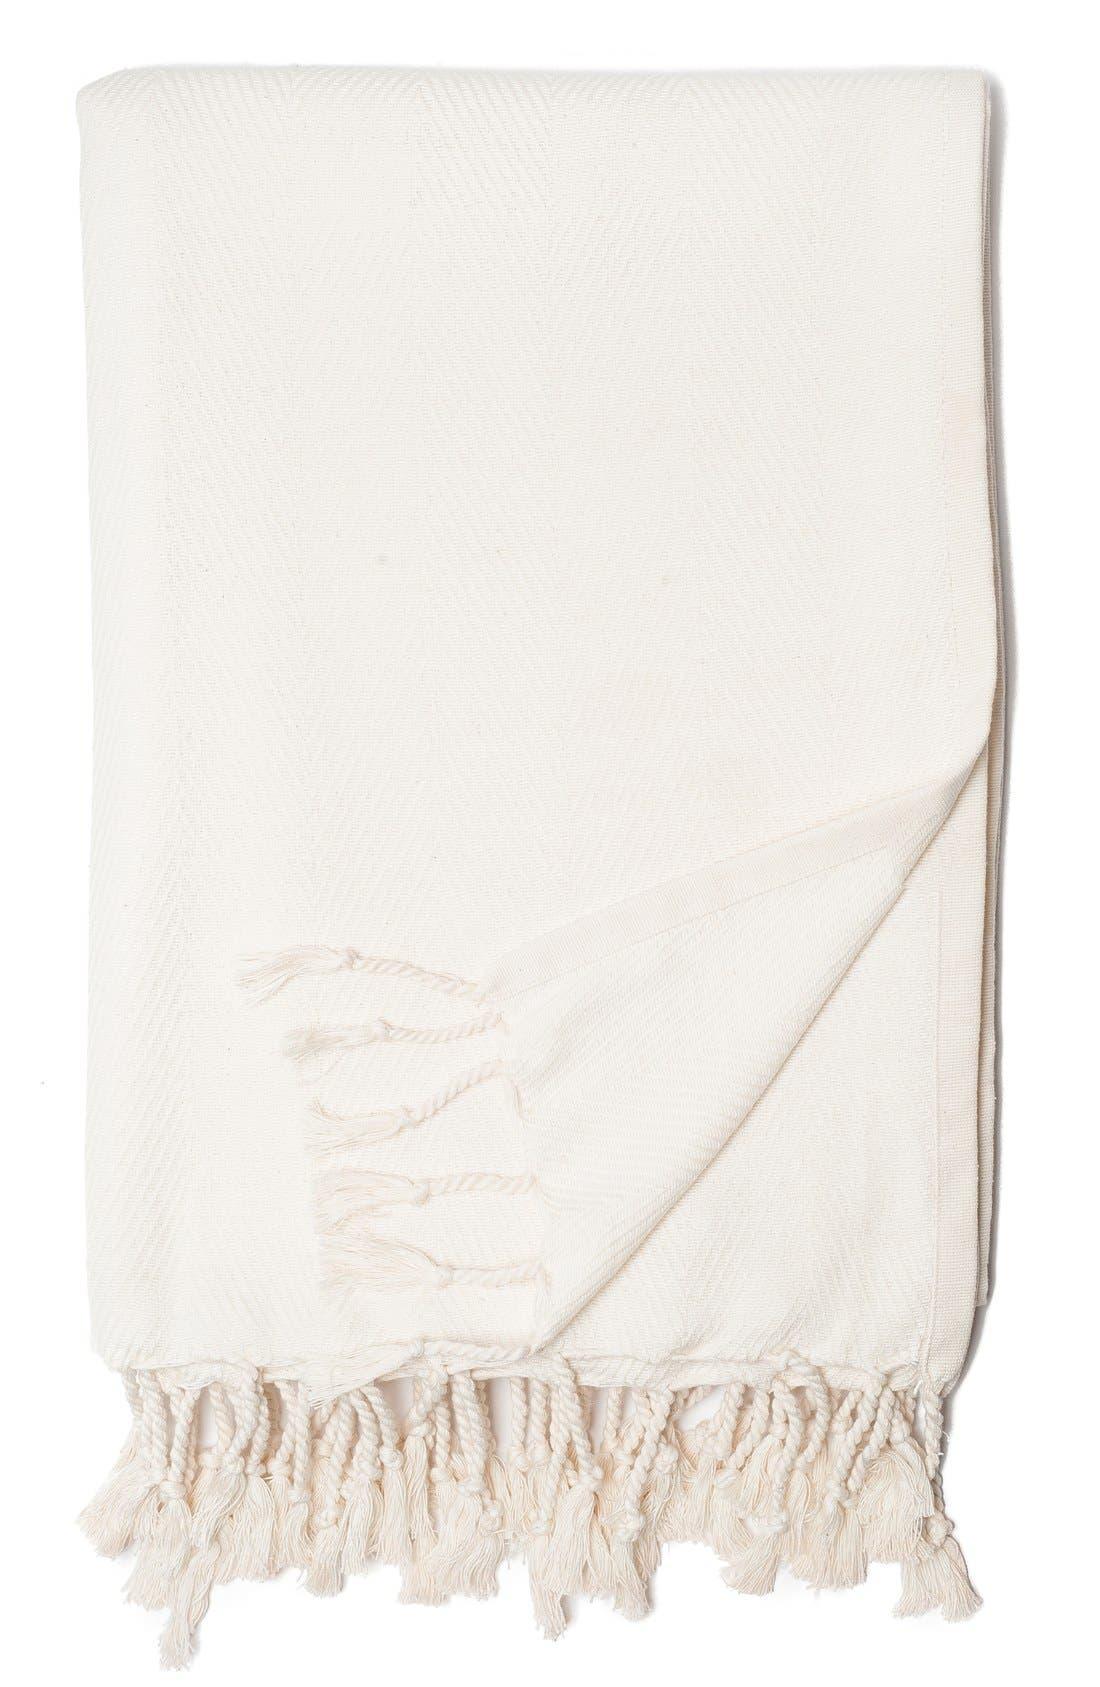 Organic Cotton Throw,                         Main,                         color, White